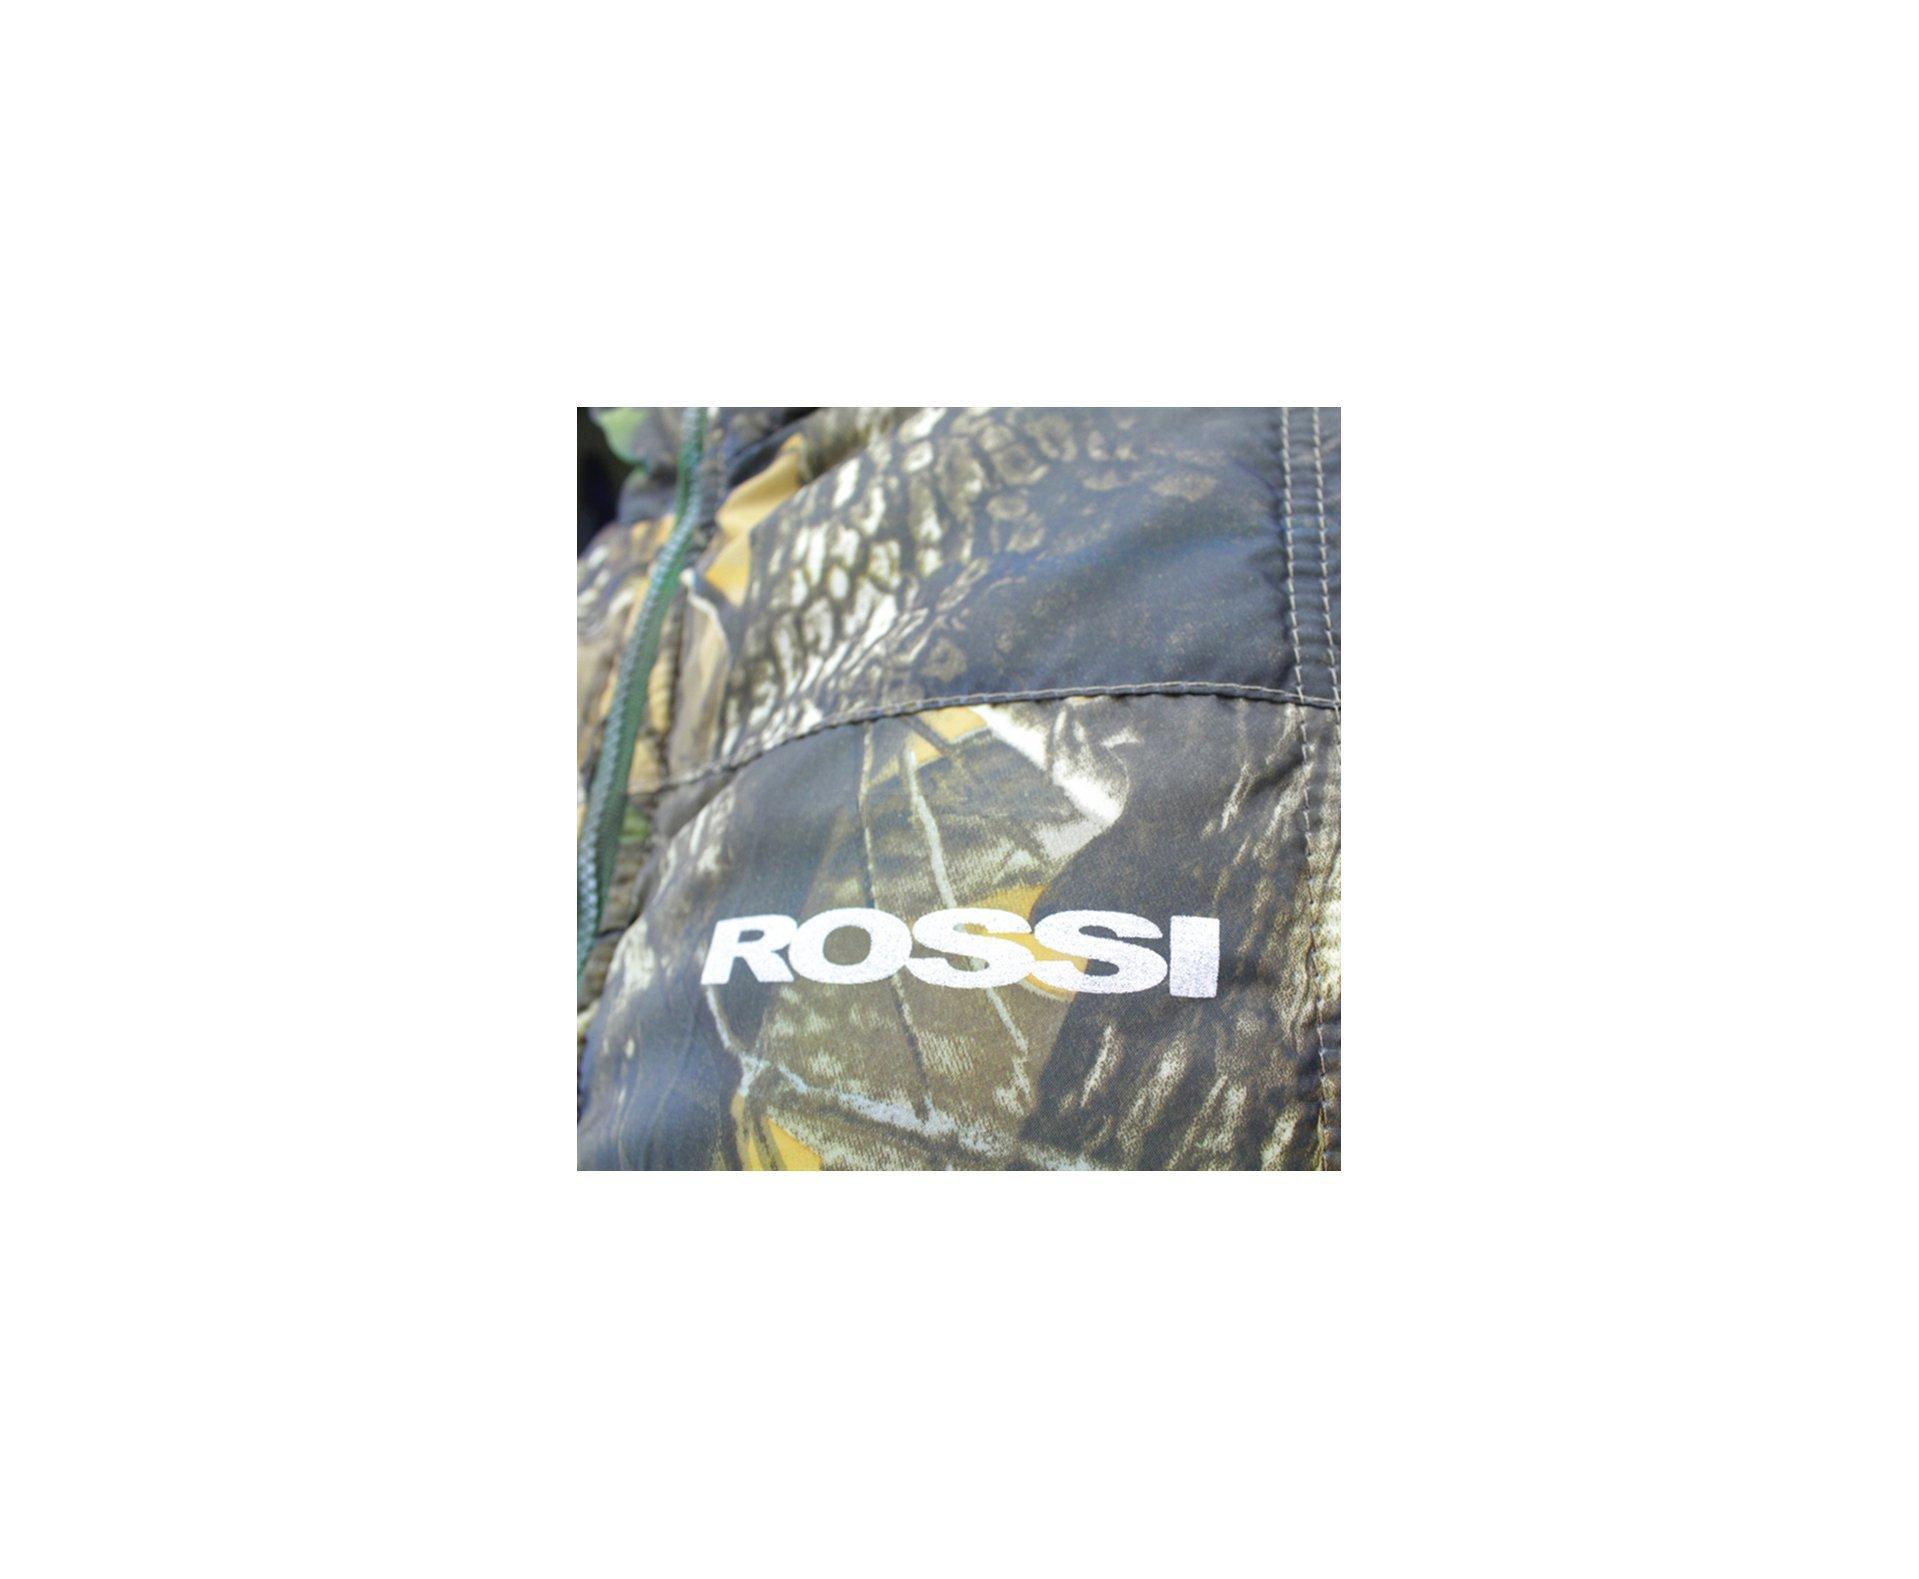 Colete Explorer Camuflado Folha Gg - Rossi